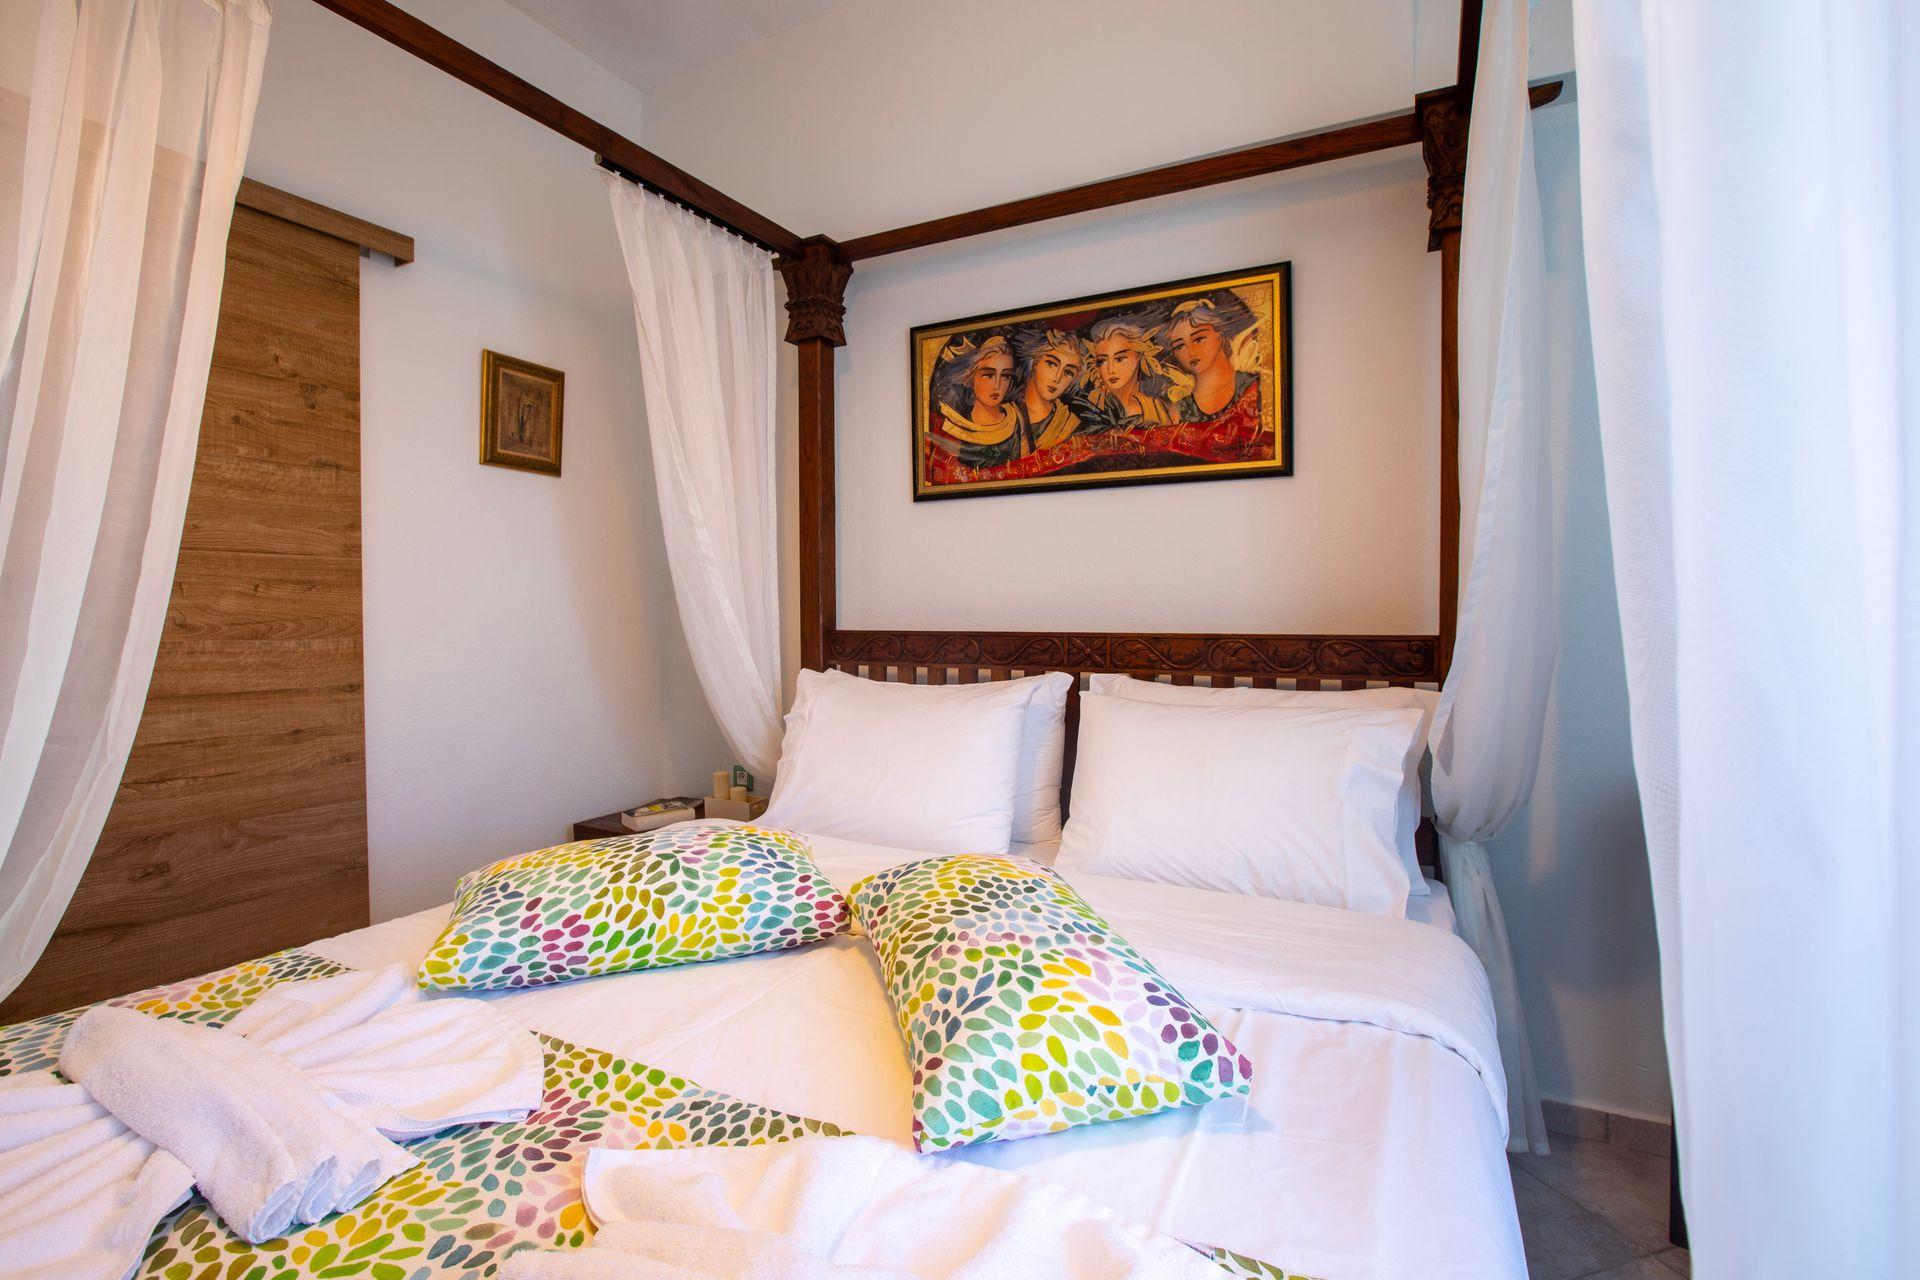 Kastro Apartments Crete -Ρέθυμνο, Κρήτη ✦ 2 Ημέρες (1 Διανυκτέρευση) ✦ έως 4 άτομα ✦ Χωρίς Πρωινό ✦ 01/06/2021 έως 30/09/2021 ✦ Κοντά σε παραλία!